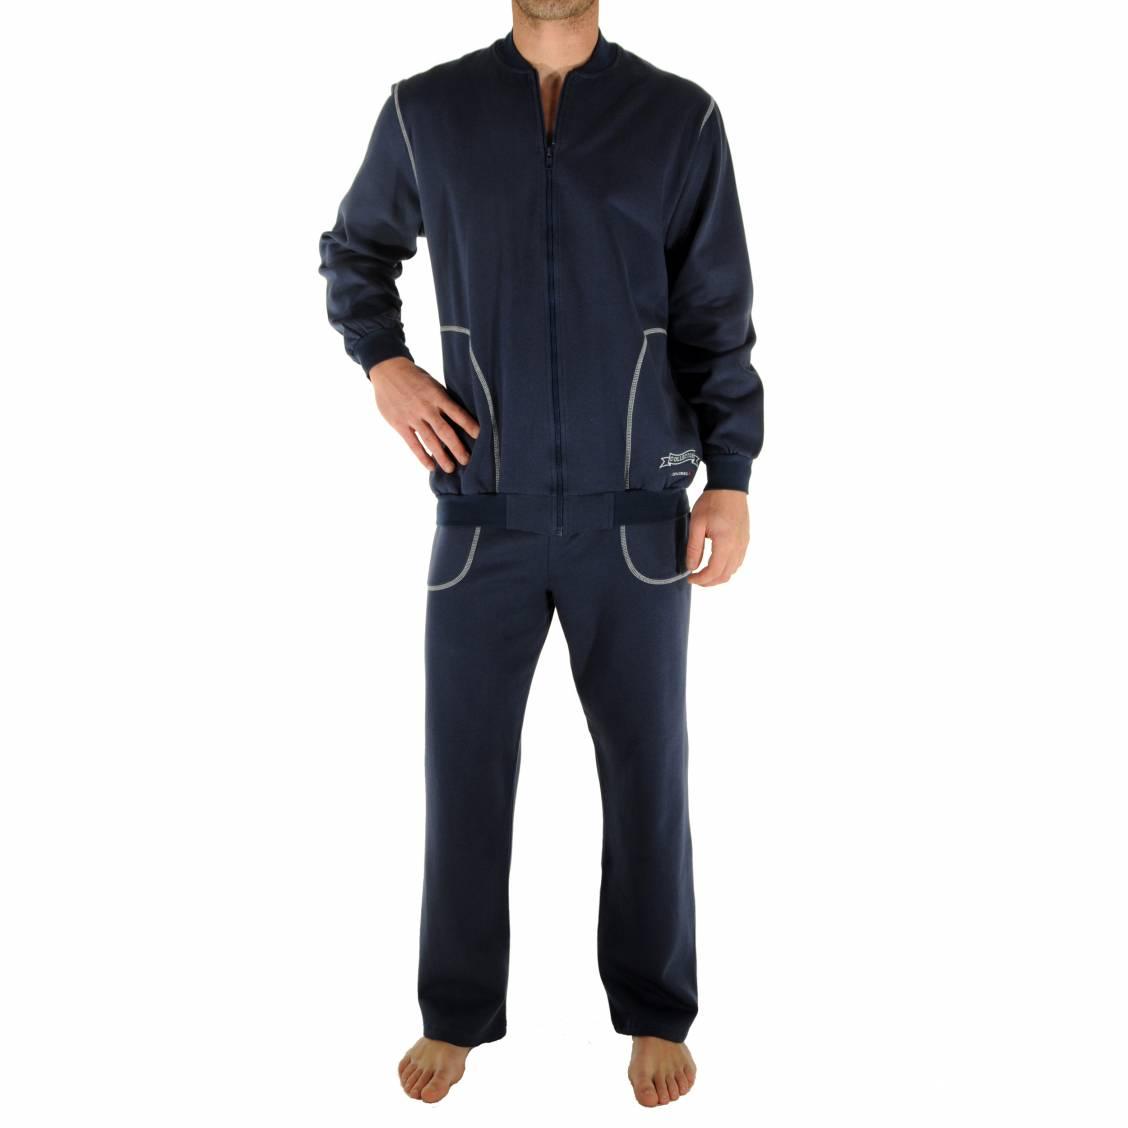 pyjama homme original jusqu 50 pureshopping. Black Bedroom Furniture Sets. Home Design Ideas